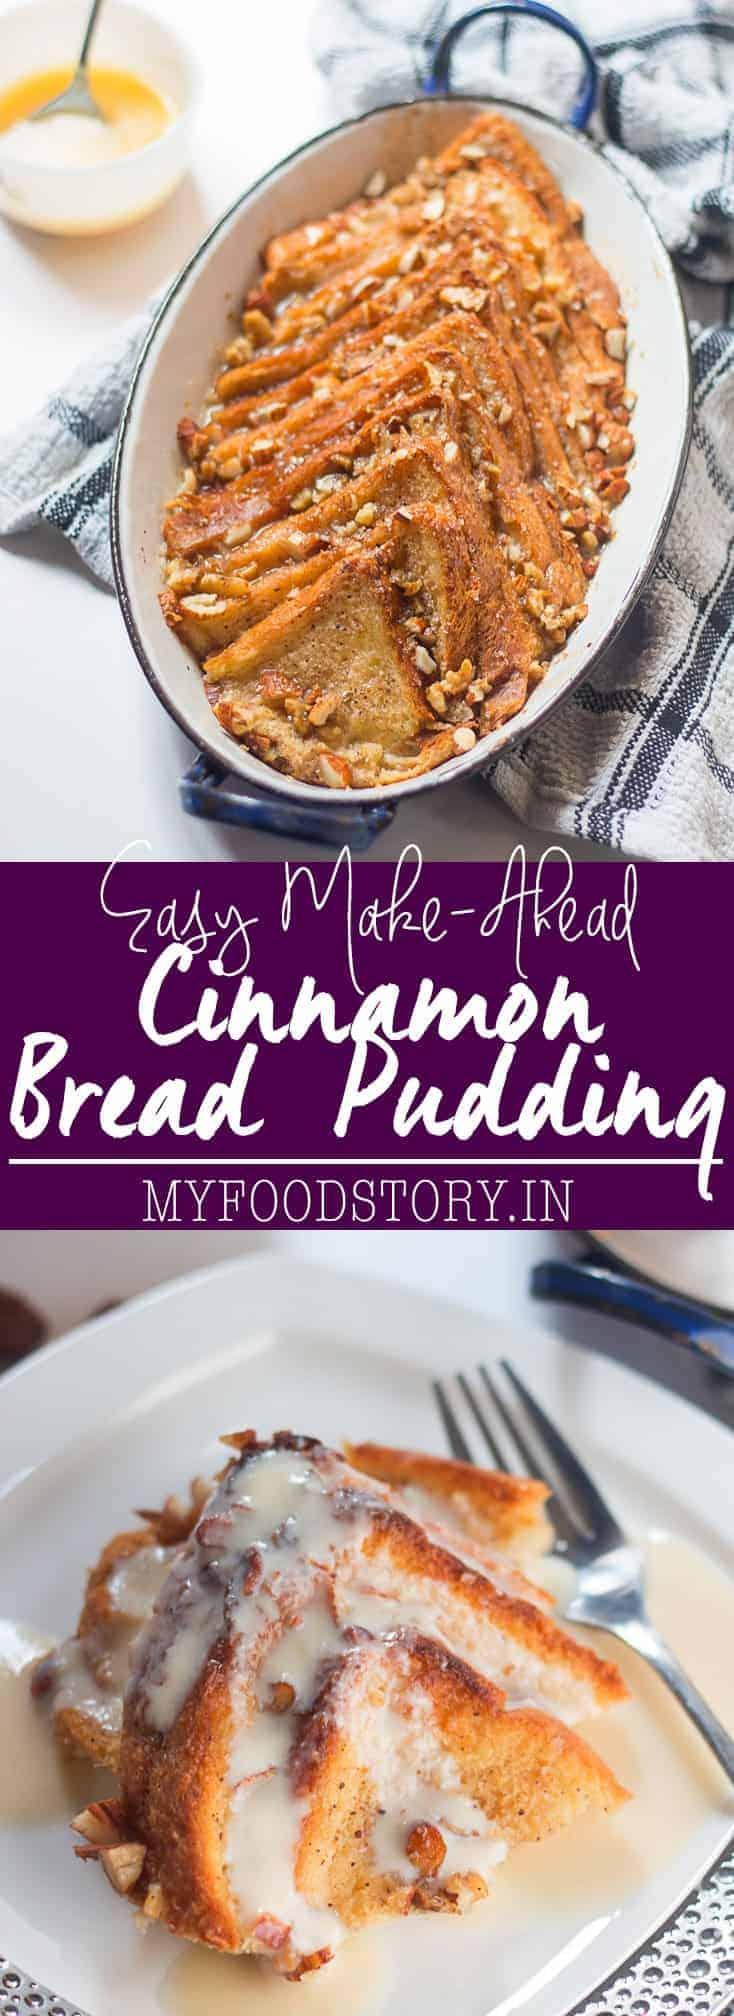 Easy Make-Ahead Cinnamon Bread Pudding